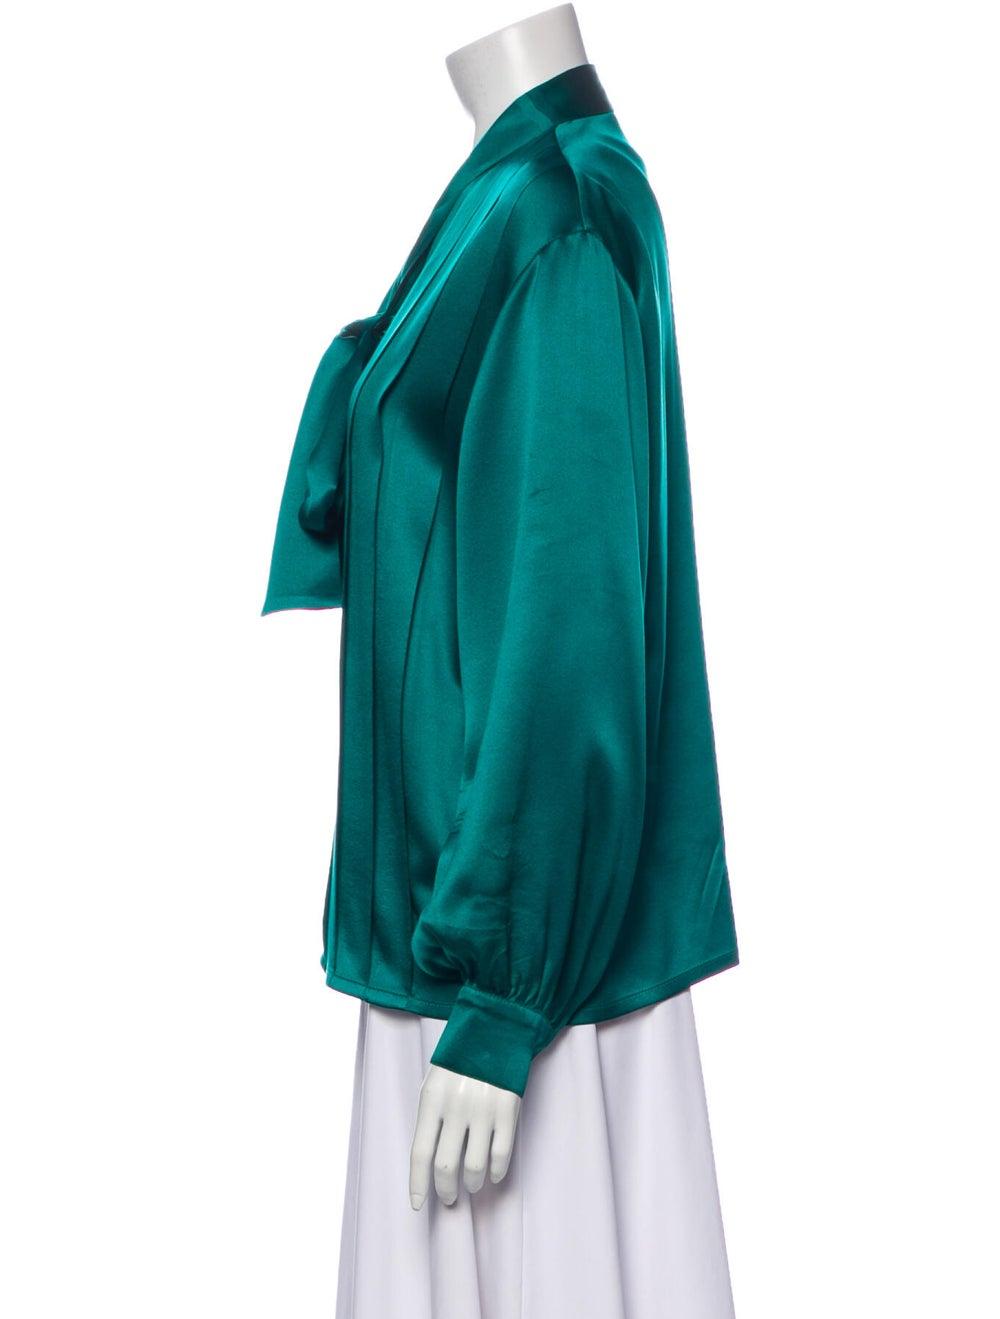 Christian Dior Vintage Silk Blouse Green - image 2